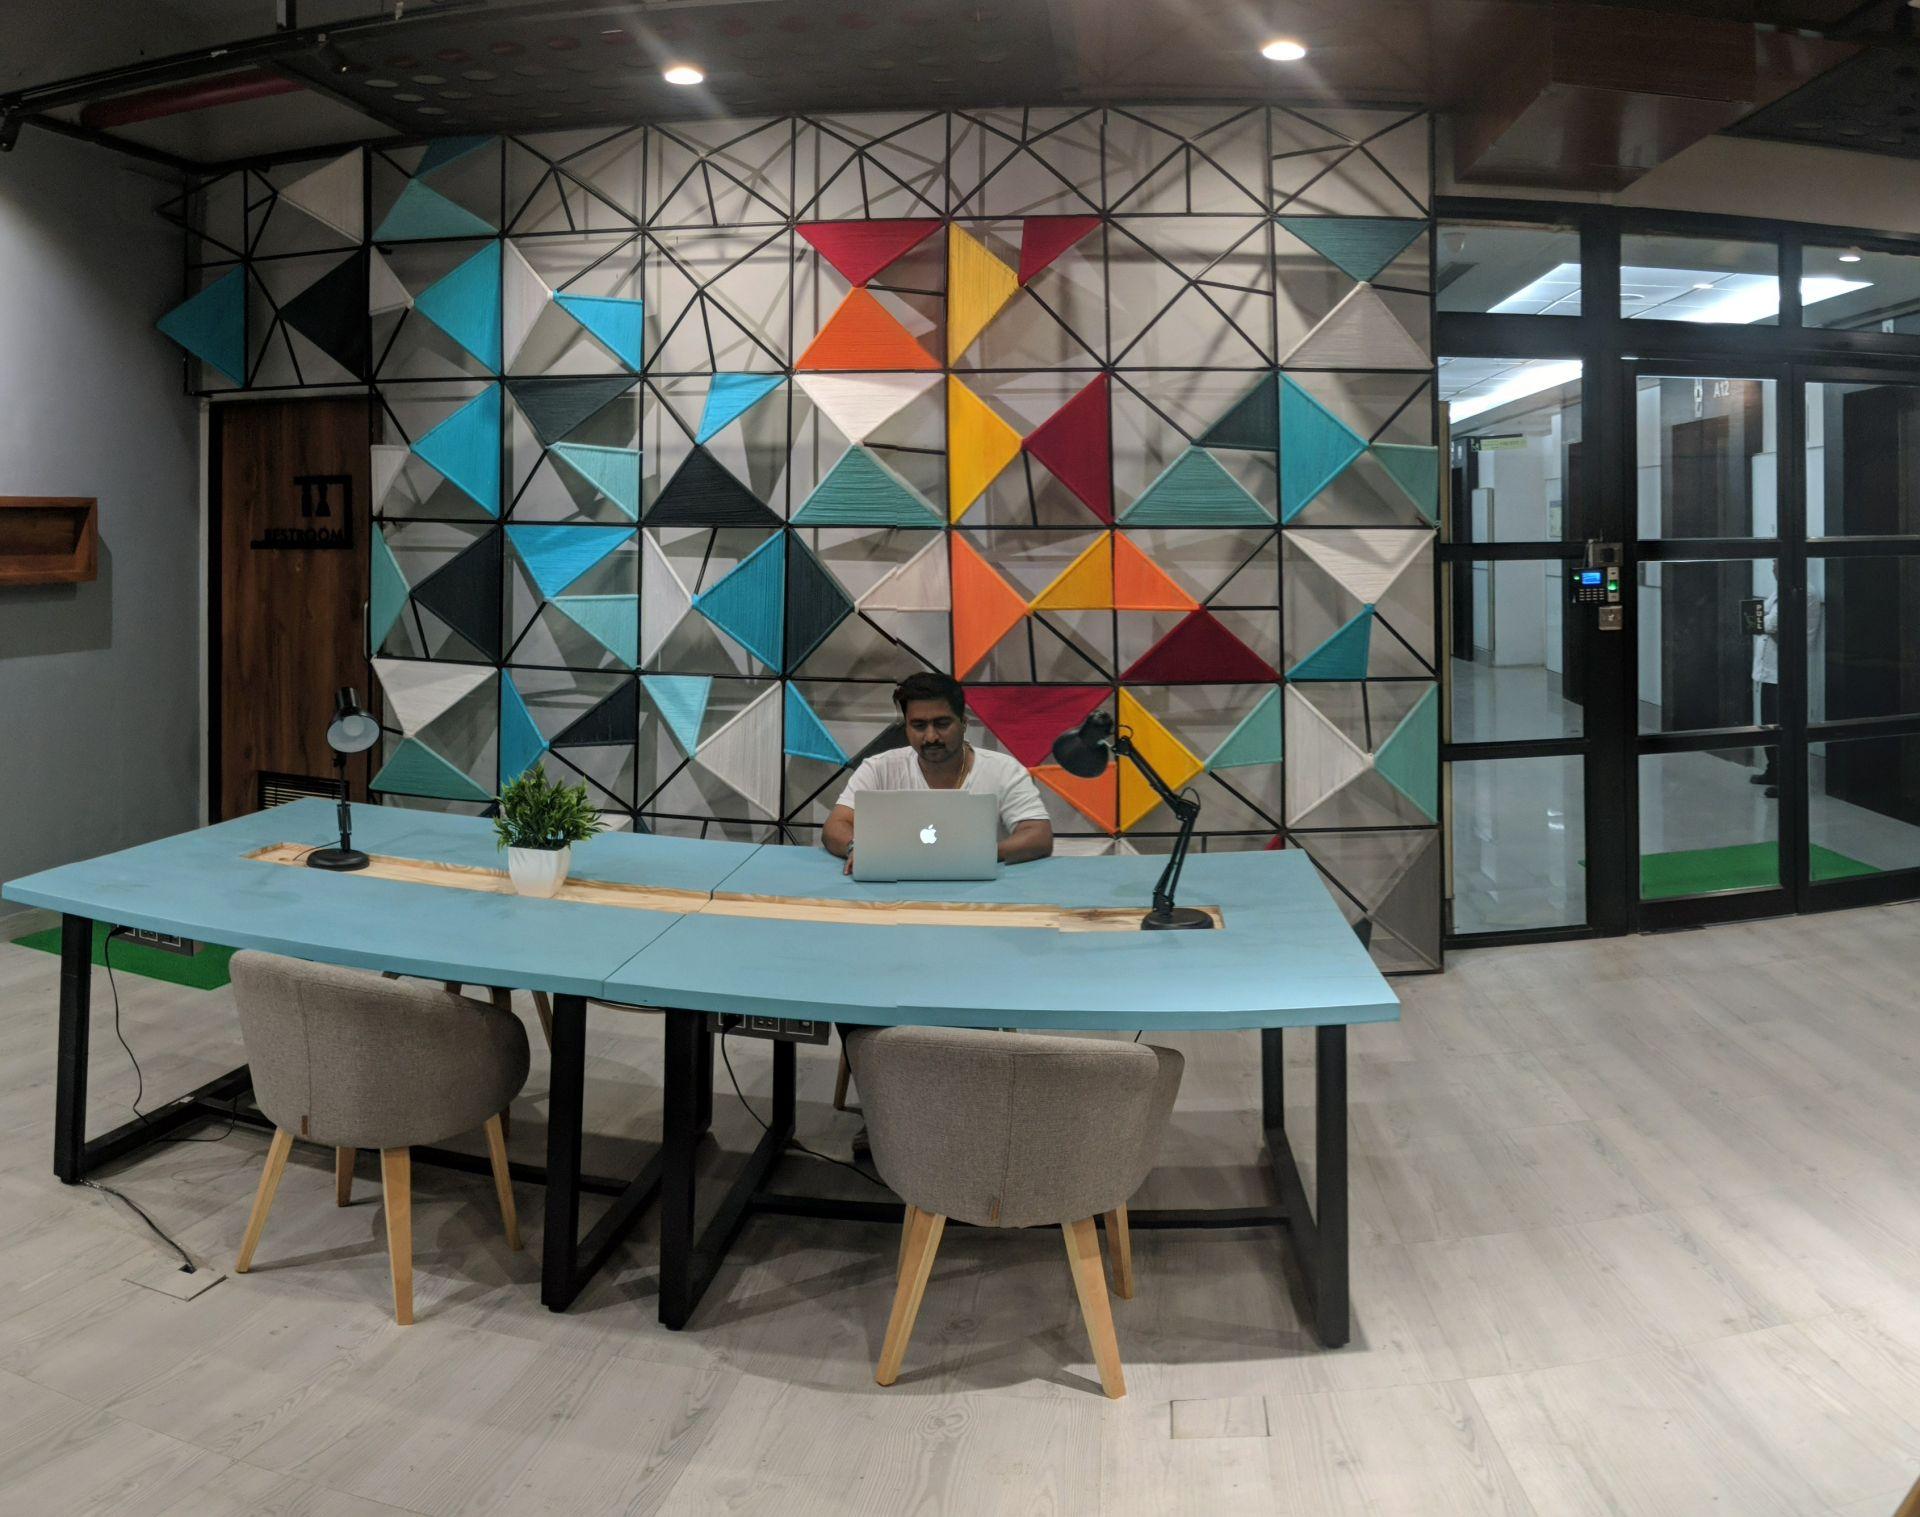 WorkAmp spaces Private Limited, Mumbai